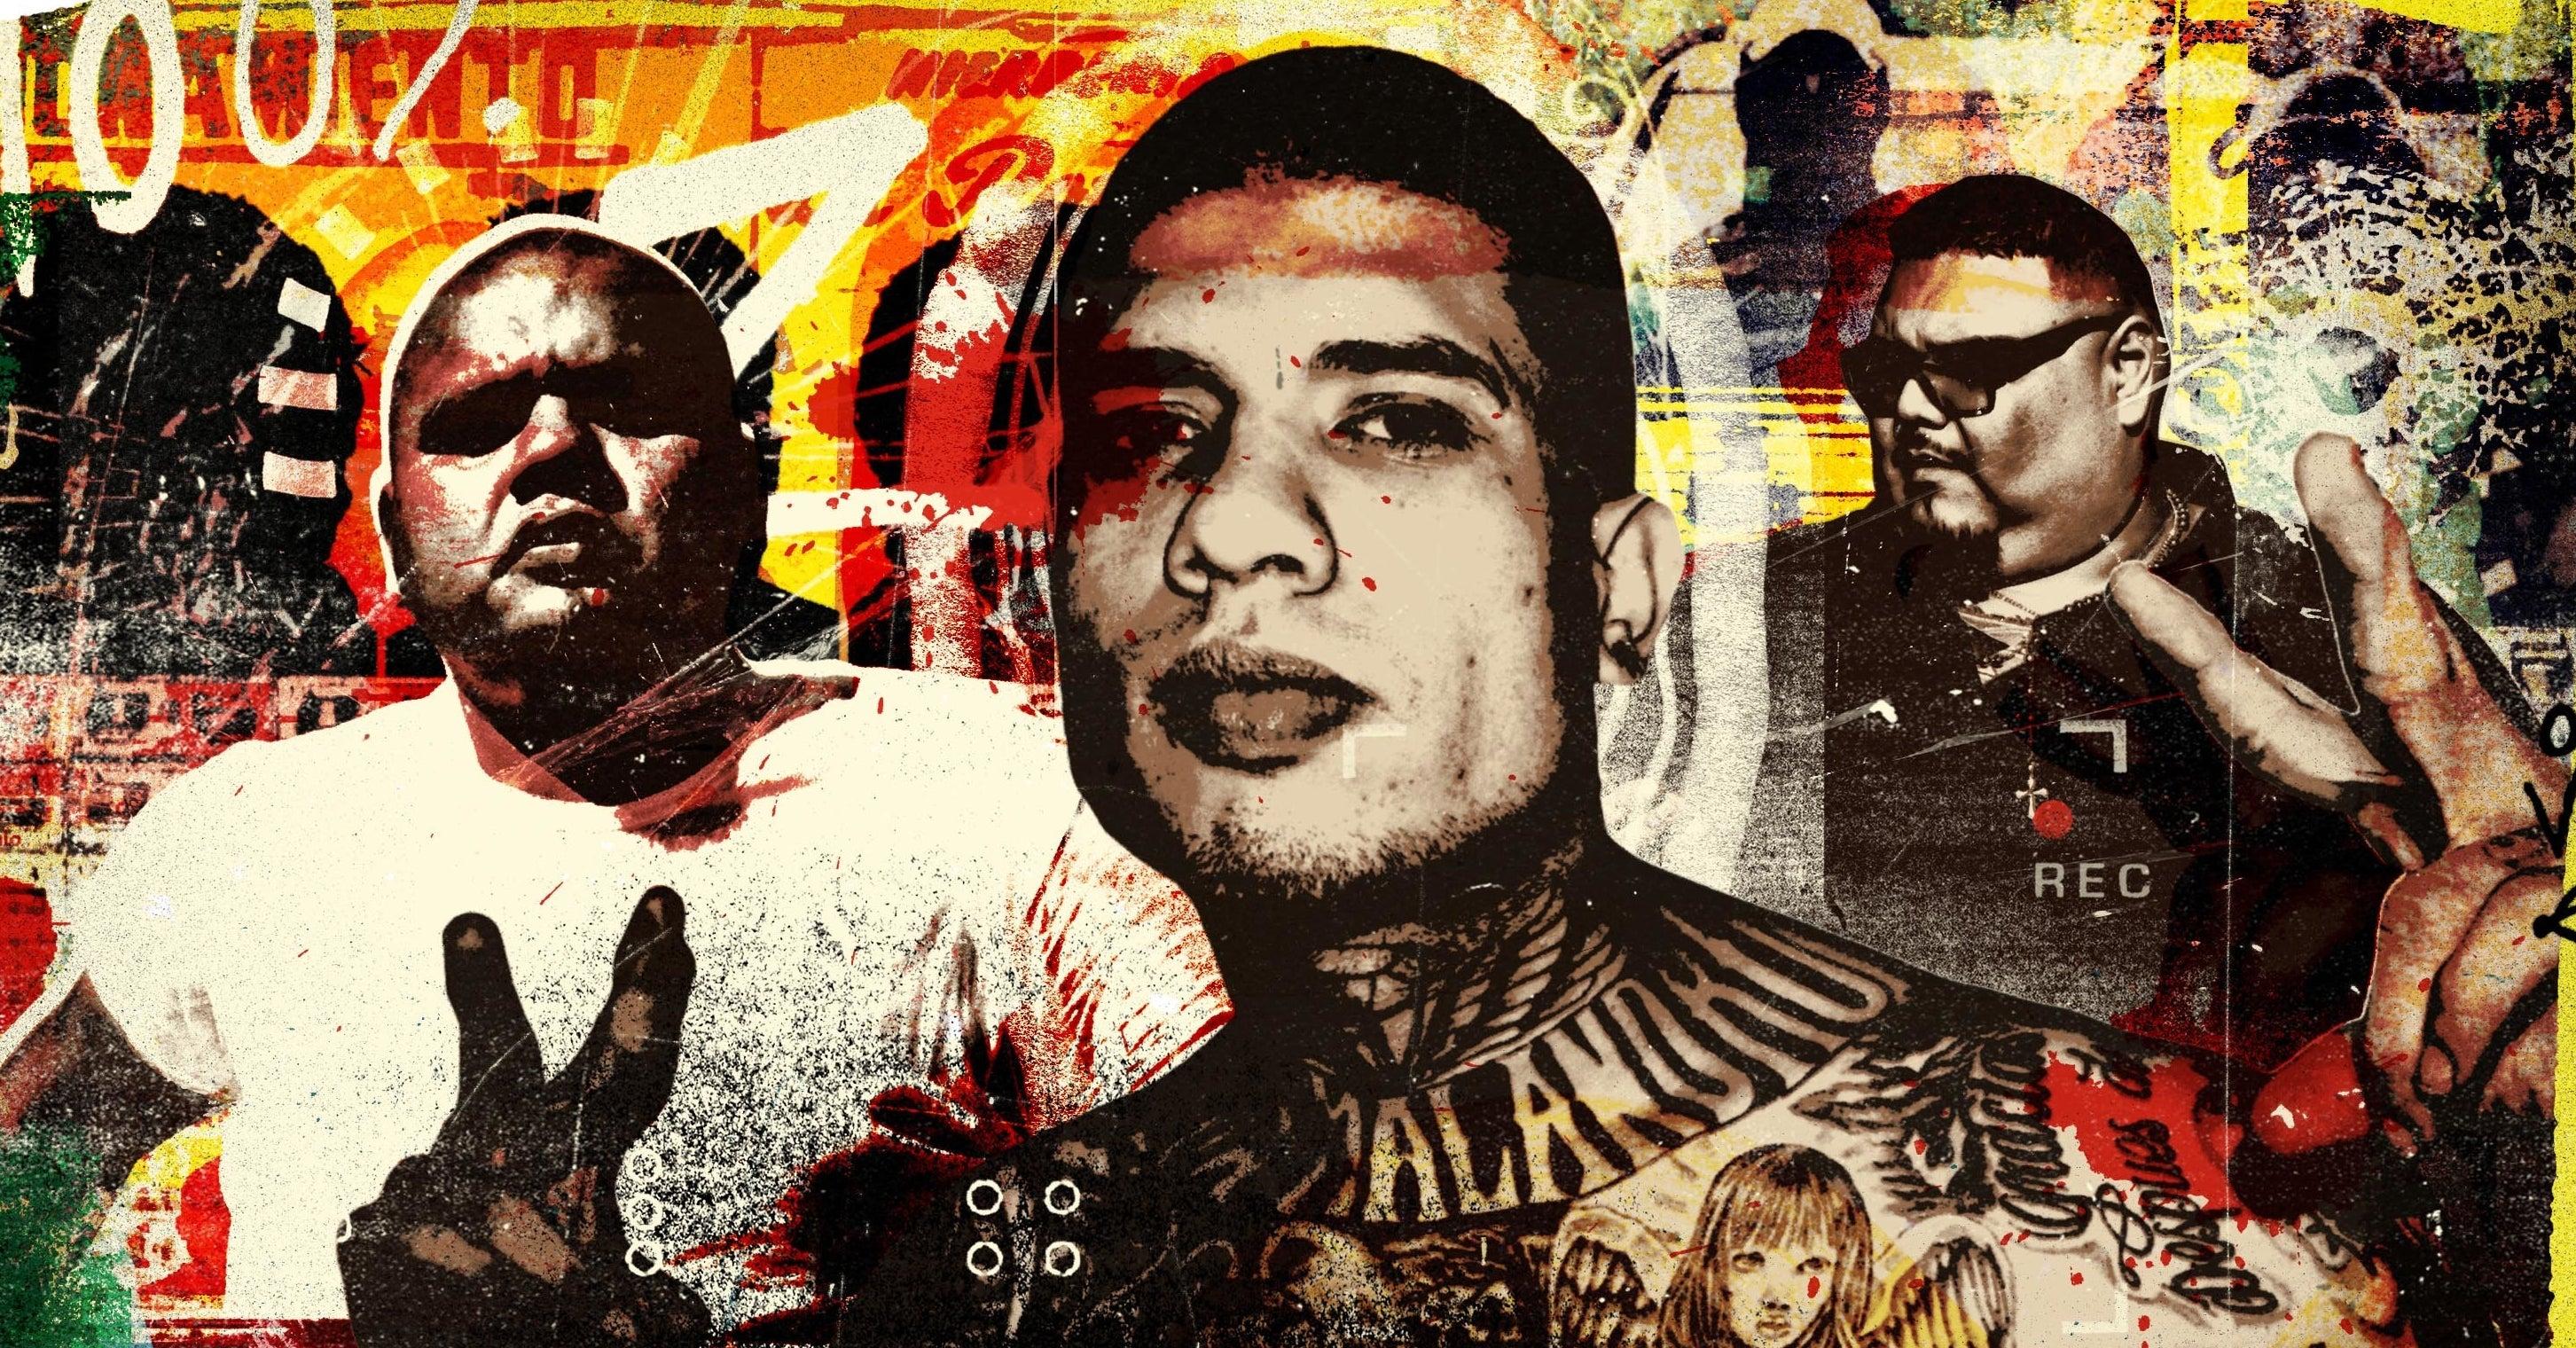 Seaside gangster rap video leads to 7 arrests